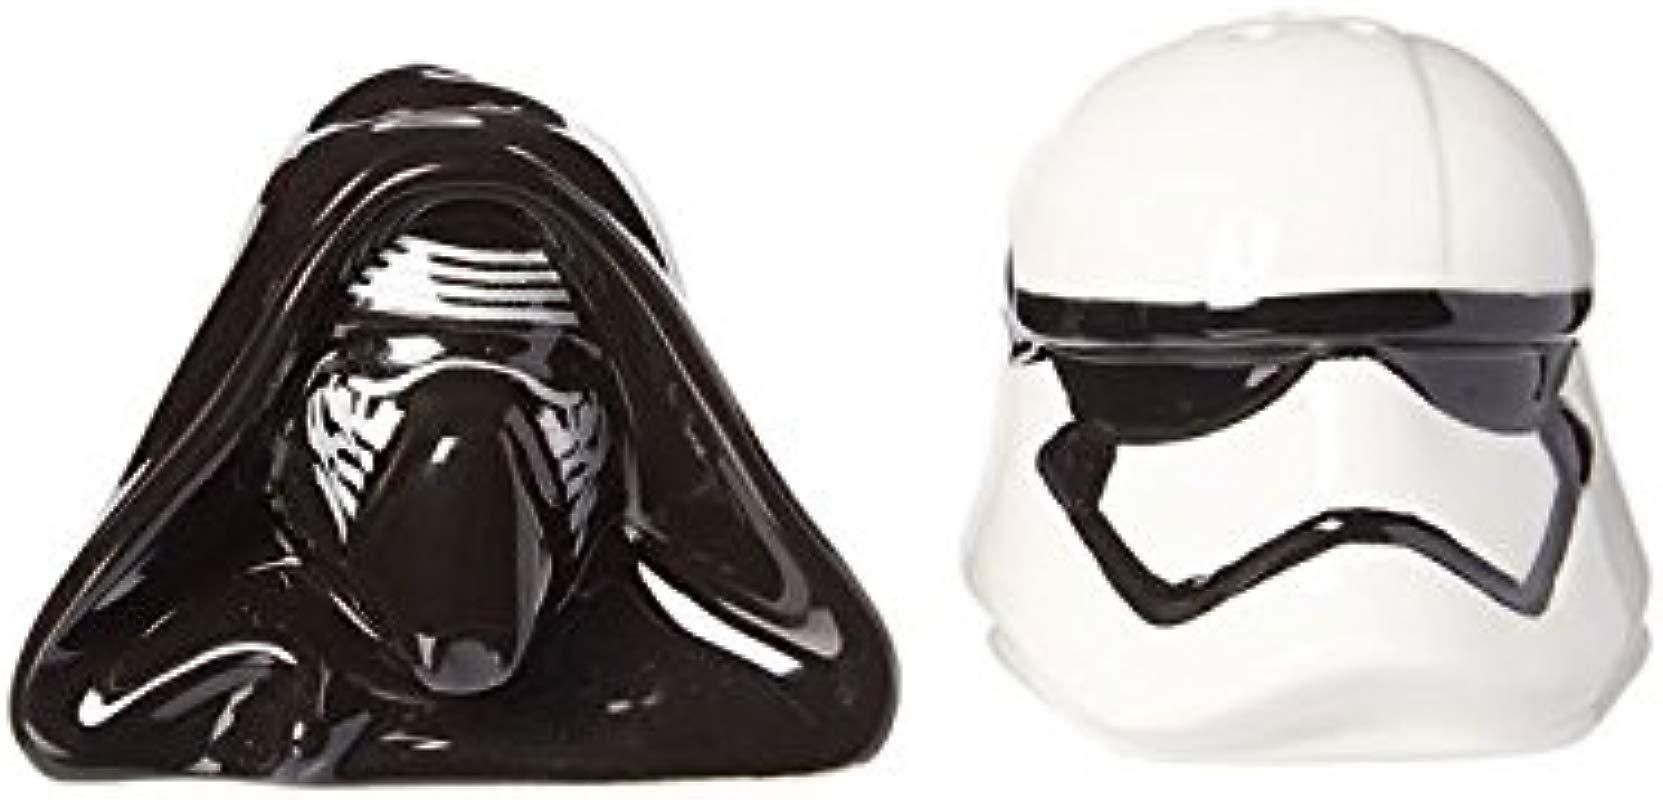 Seven20 Star Wars Kylo Ren And Stomtrooper Salt And Pepper Shaker Set None